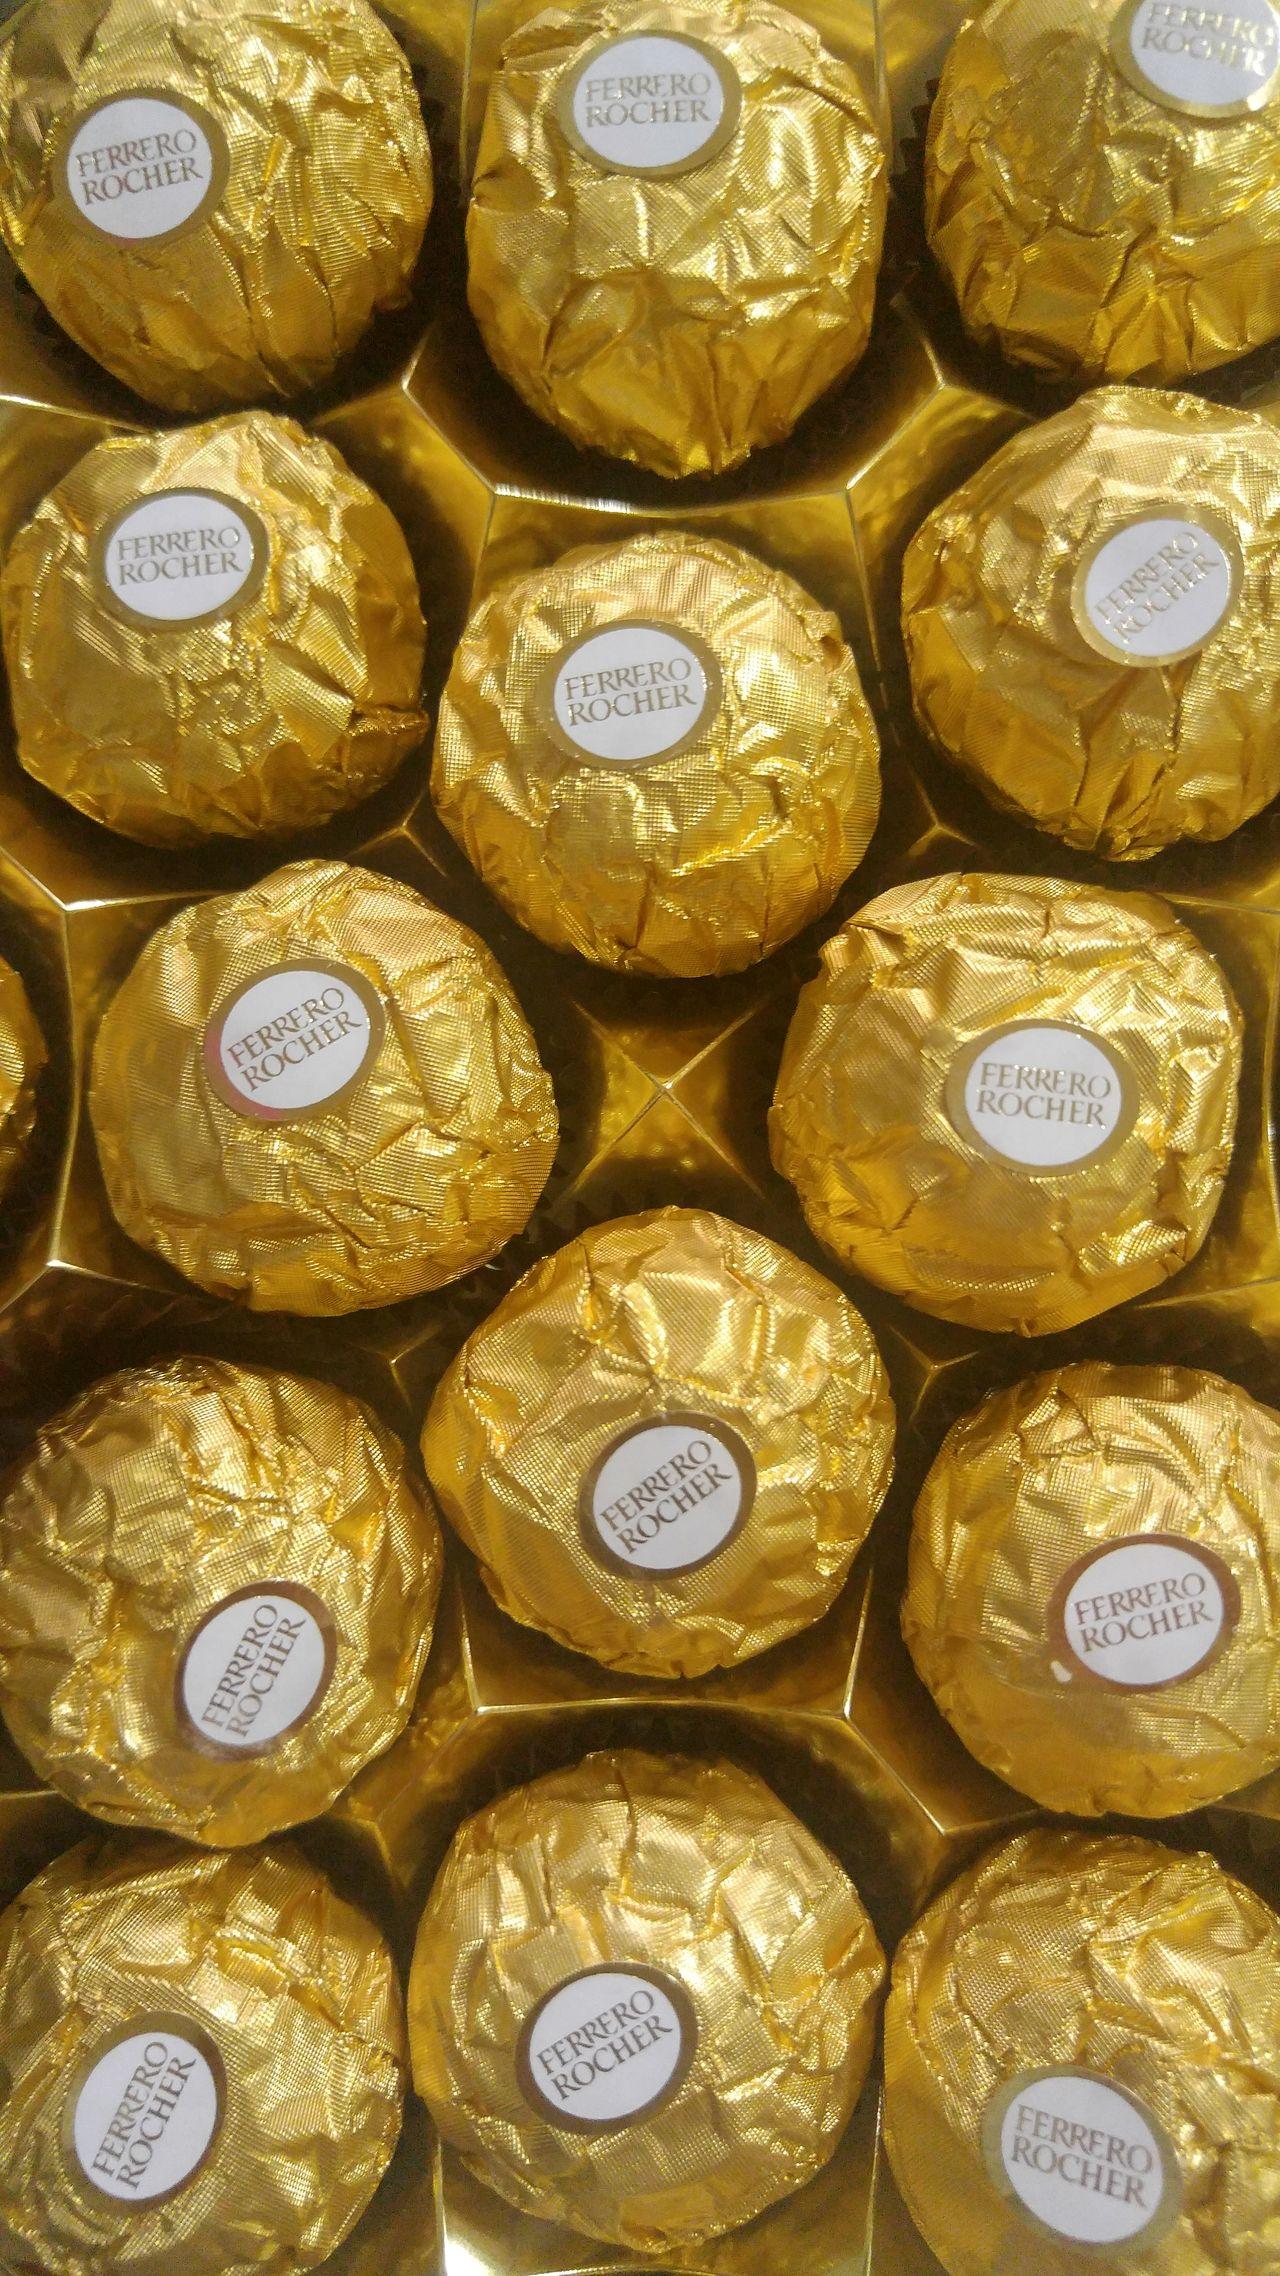 Color Palette Chocolates Ferrerorocher Chocolate♡ Delights Tasty EyeEm Eyeemphoto